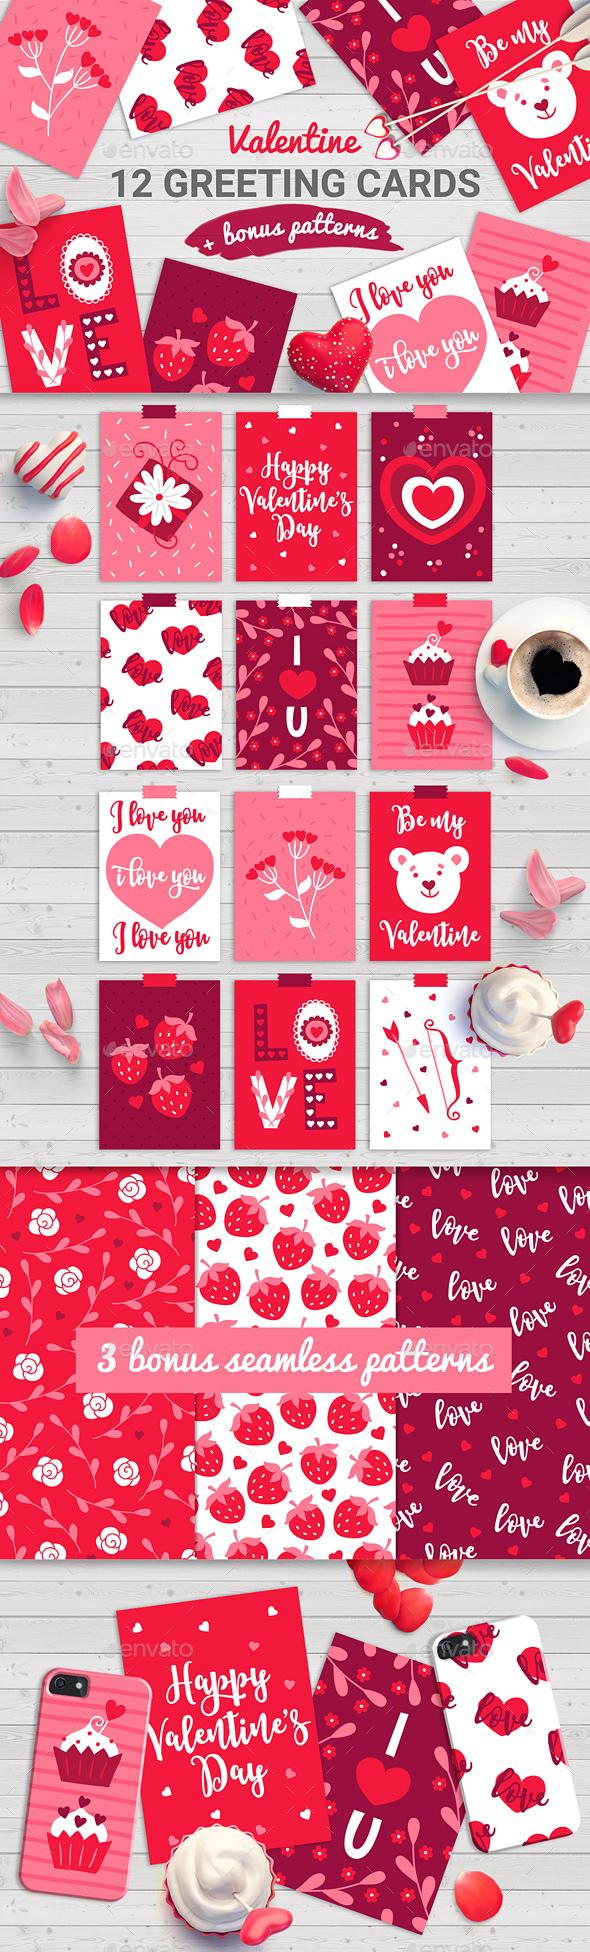 12 Valentine Cards + 3 Seamless Patterns - Valentines Seasons/Holidays